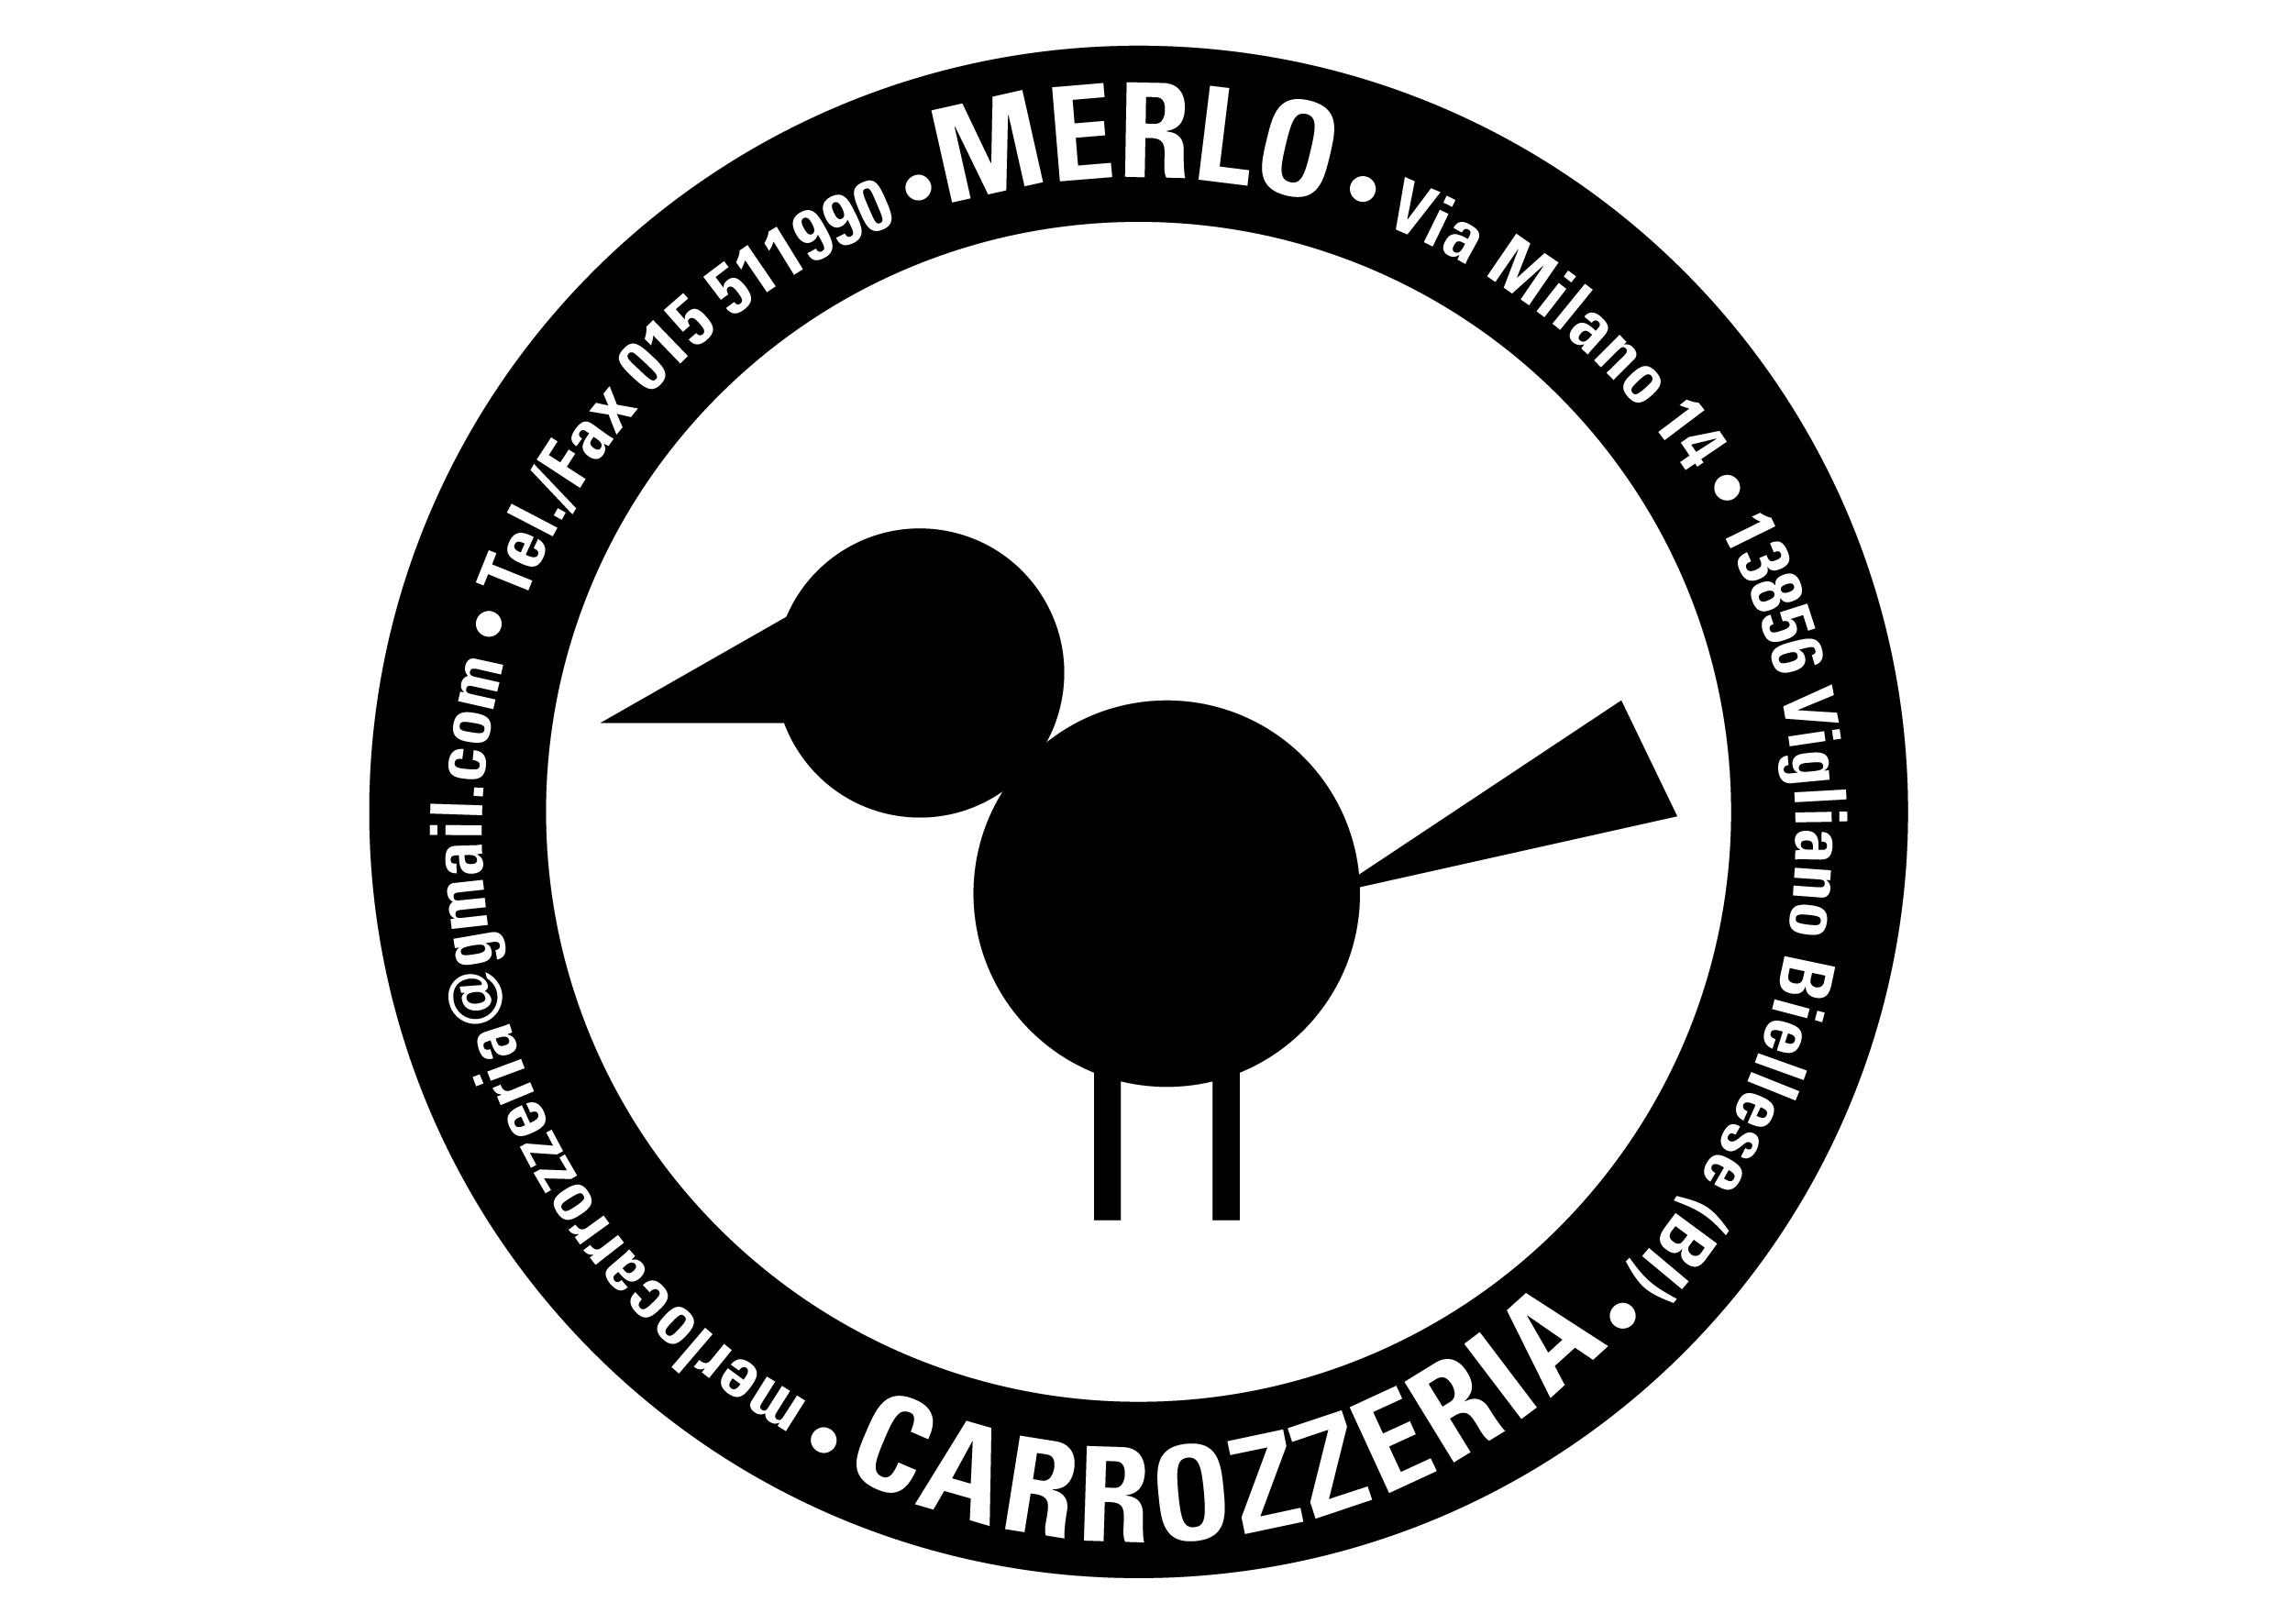 Carrozzeria Merlo - Sponsor - Reload Soundfestival